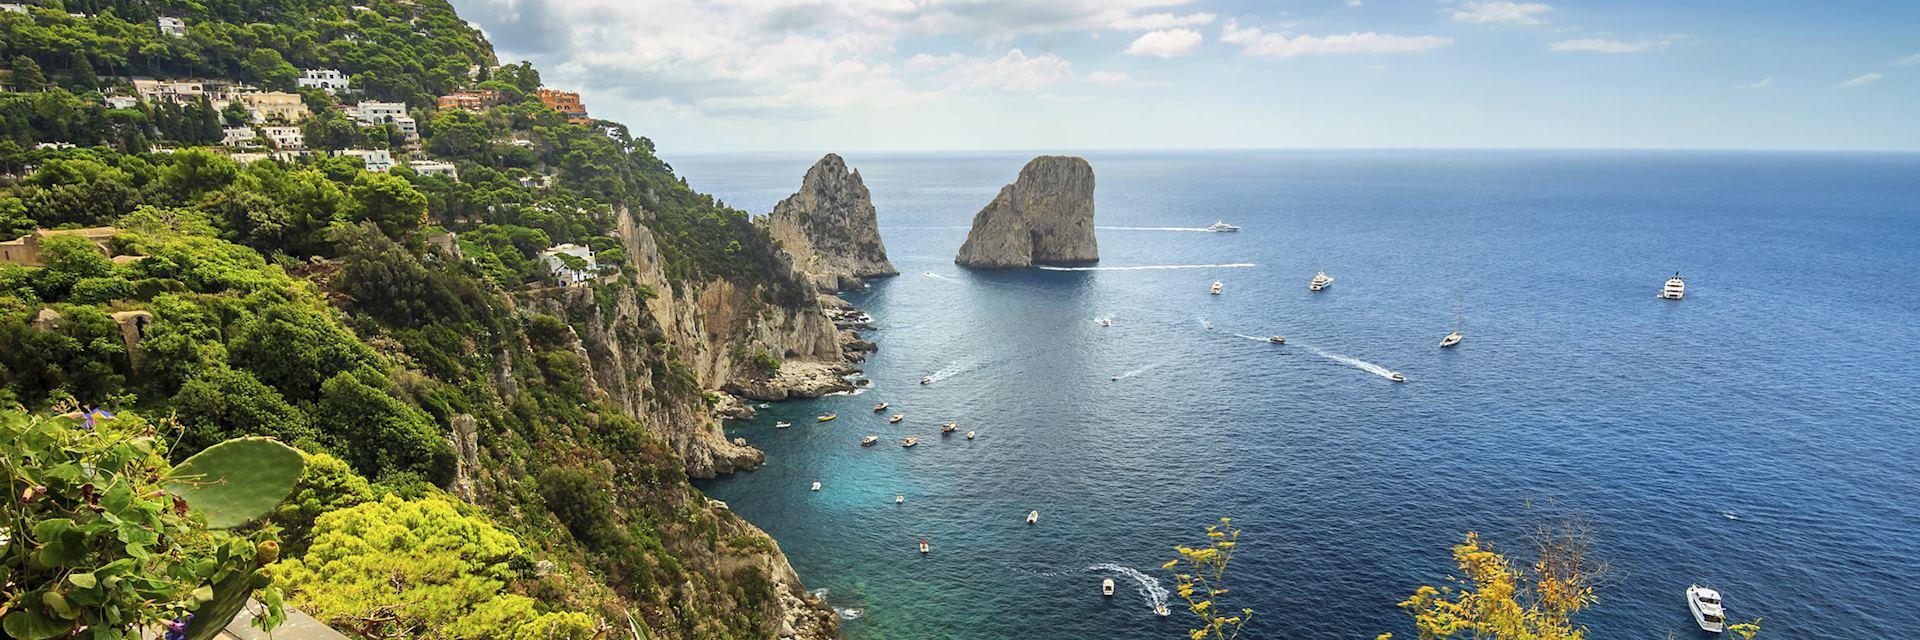 Coastal scenery, Capri Island